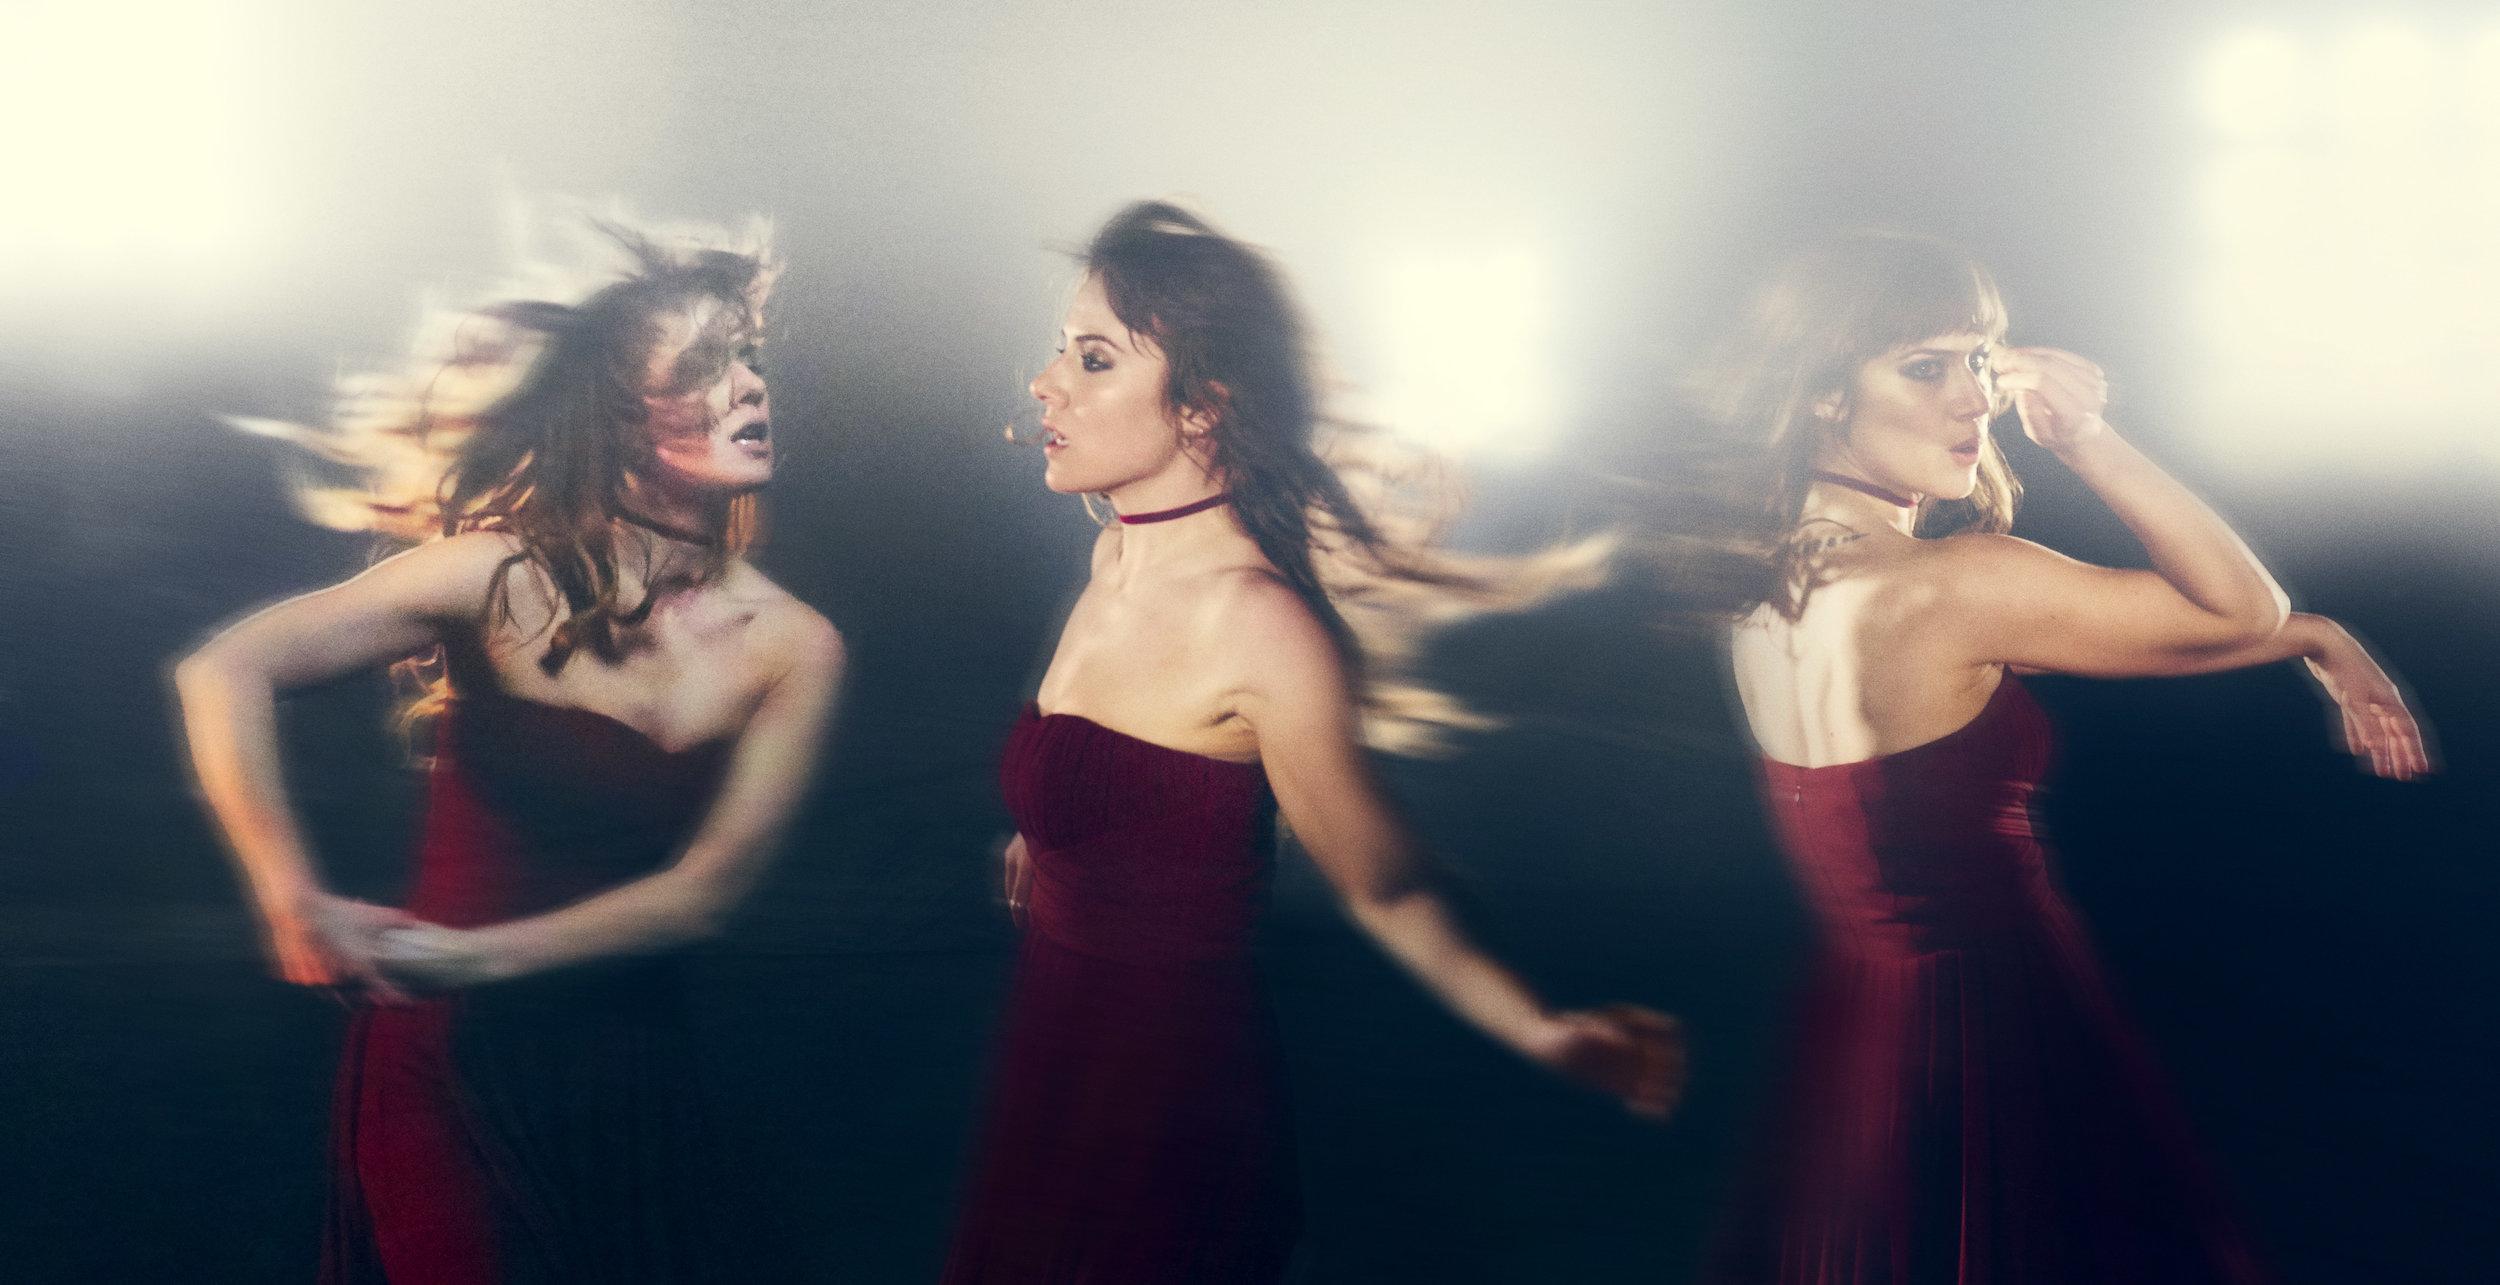 The Dancer Credit: Edwin Ingram